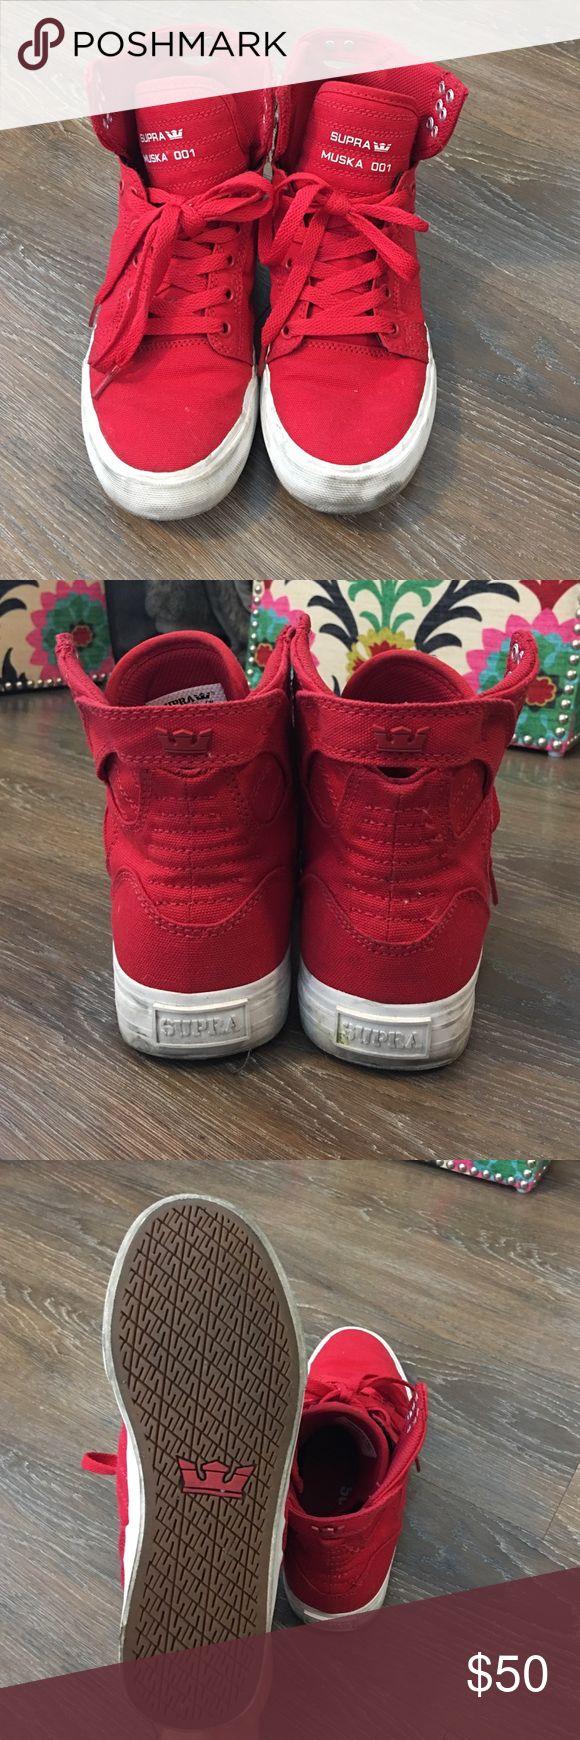 Supra Muska 001 Red Sky Tops Red Sky Top Sneakers by Supra Supra Shoes Sneakers